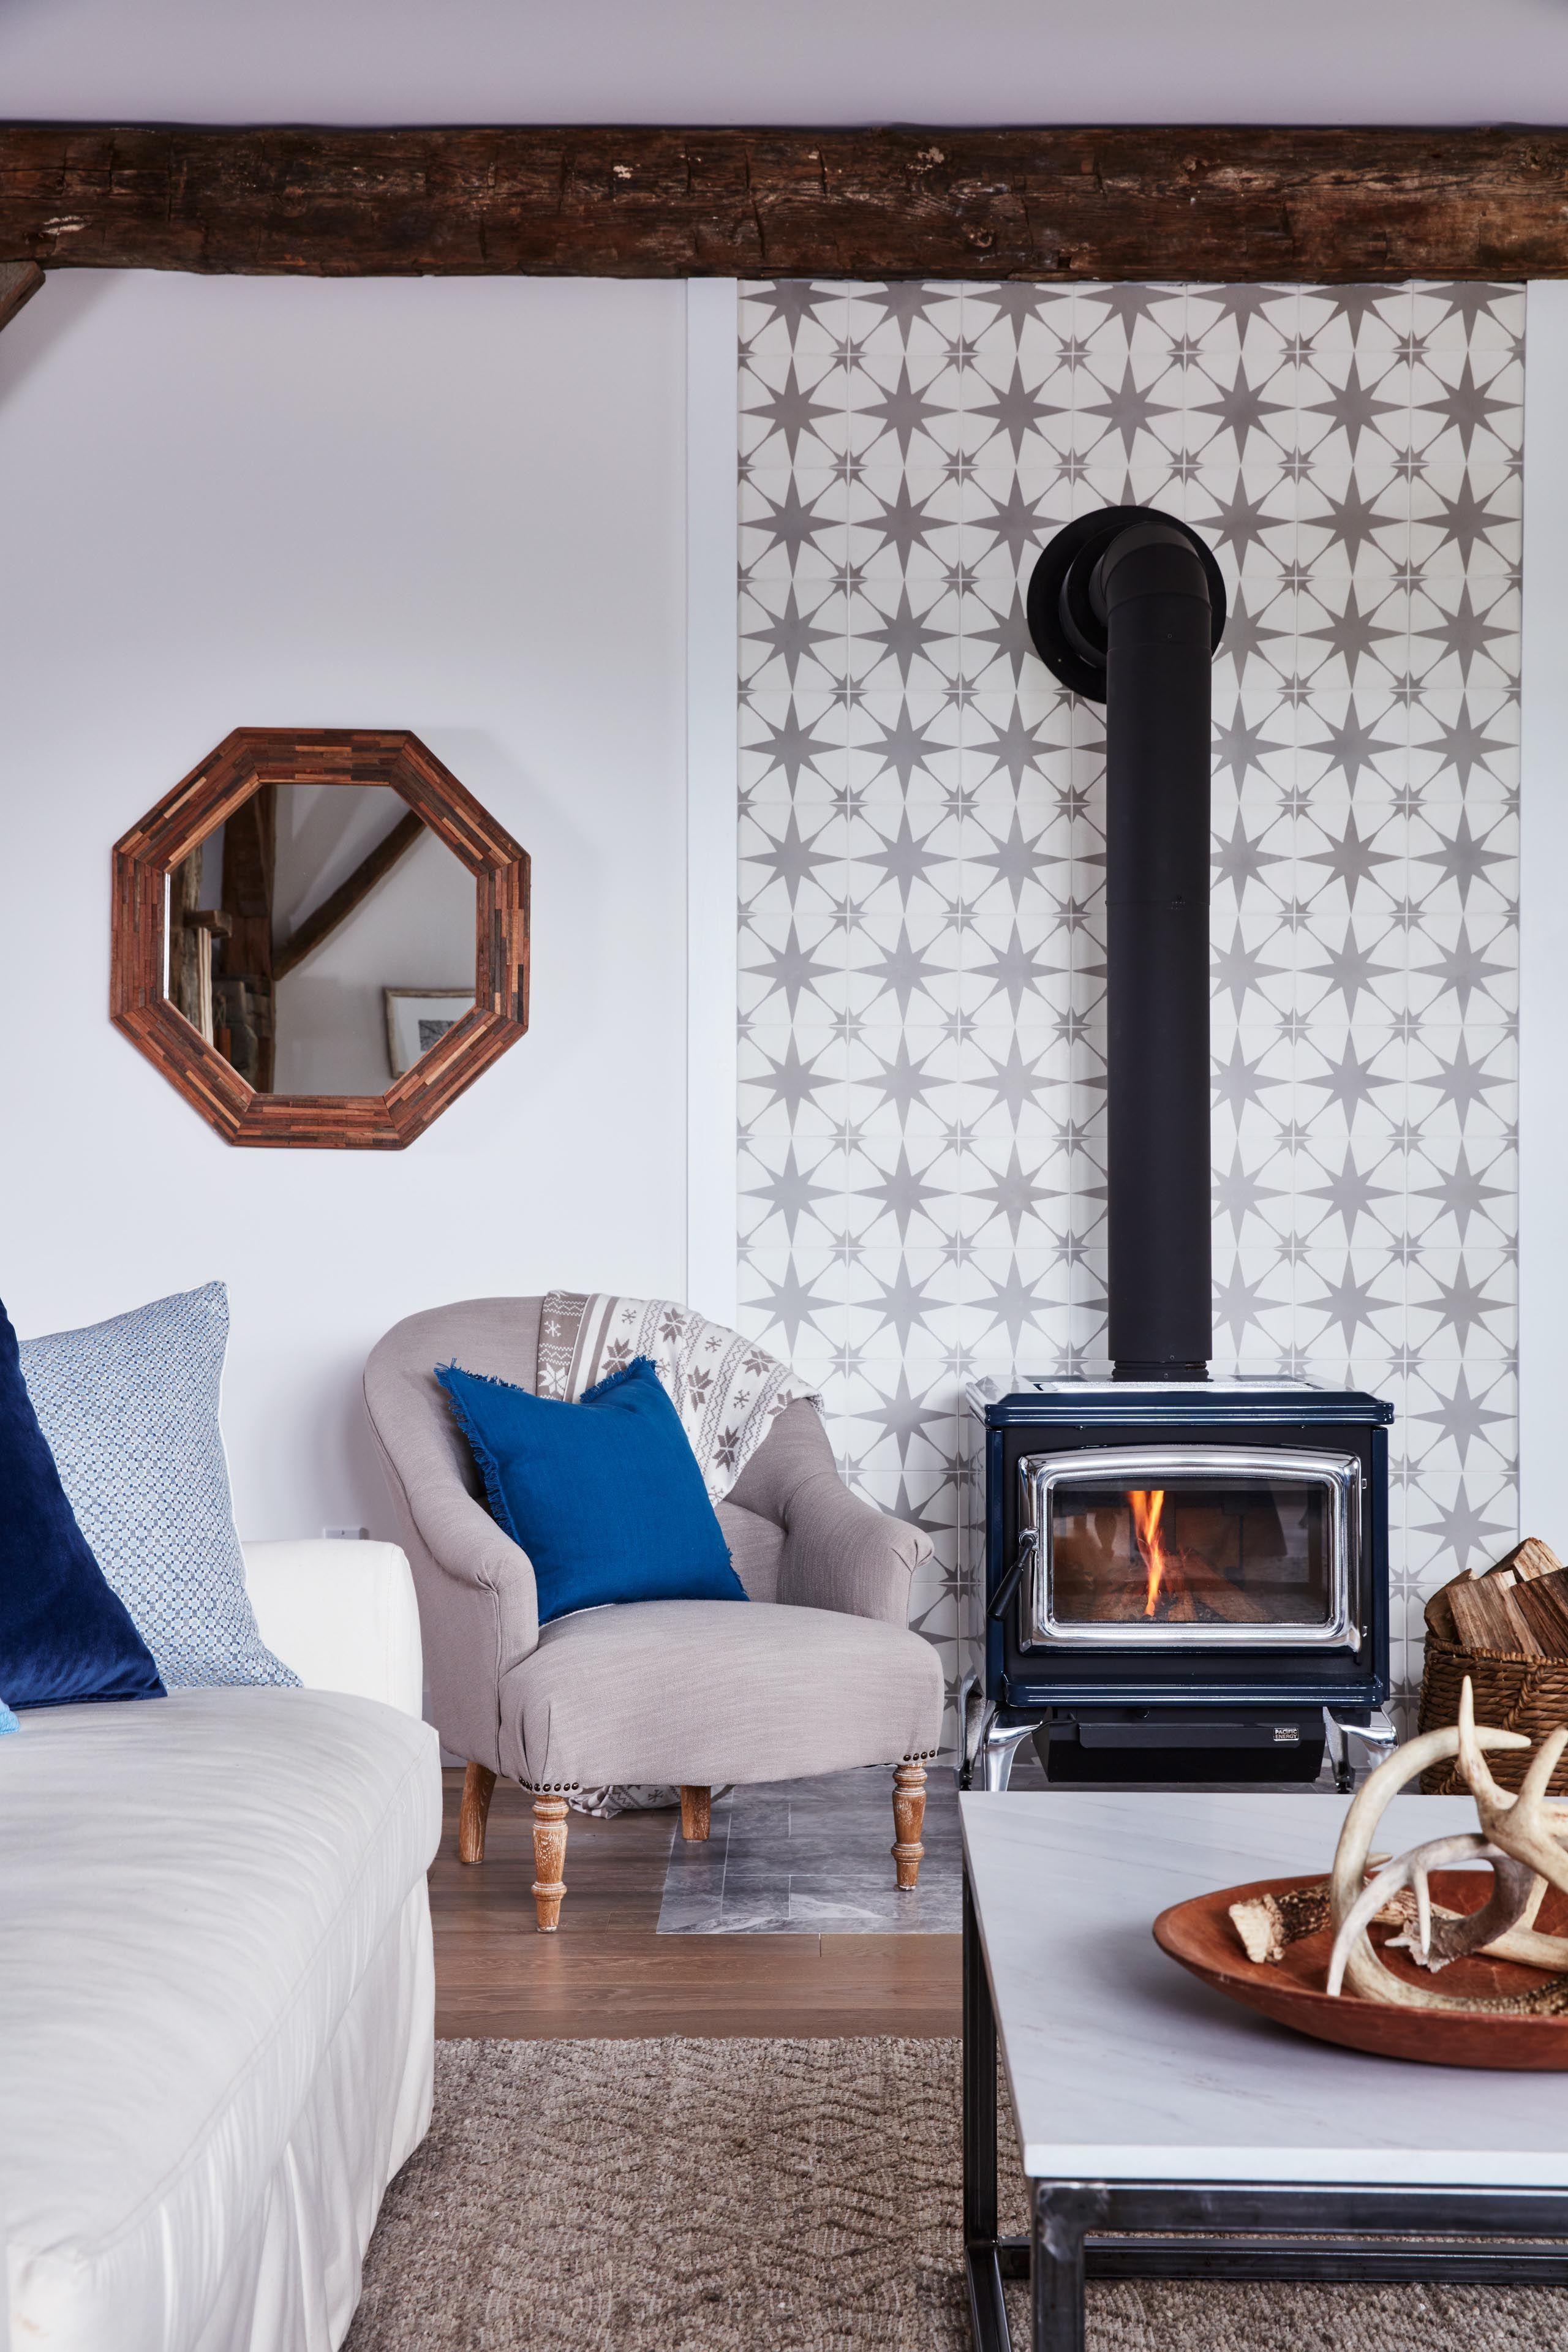 Attractive Sarah Richardsonu0027s Off The Grid Family Home. Stove FireplaceFireplace IdeasSarah  ...